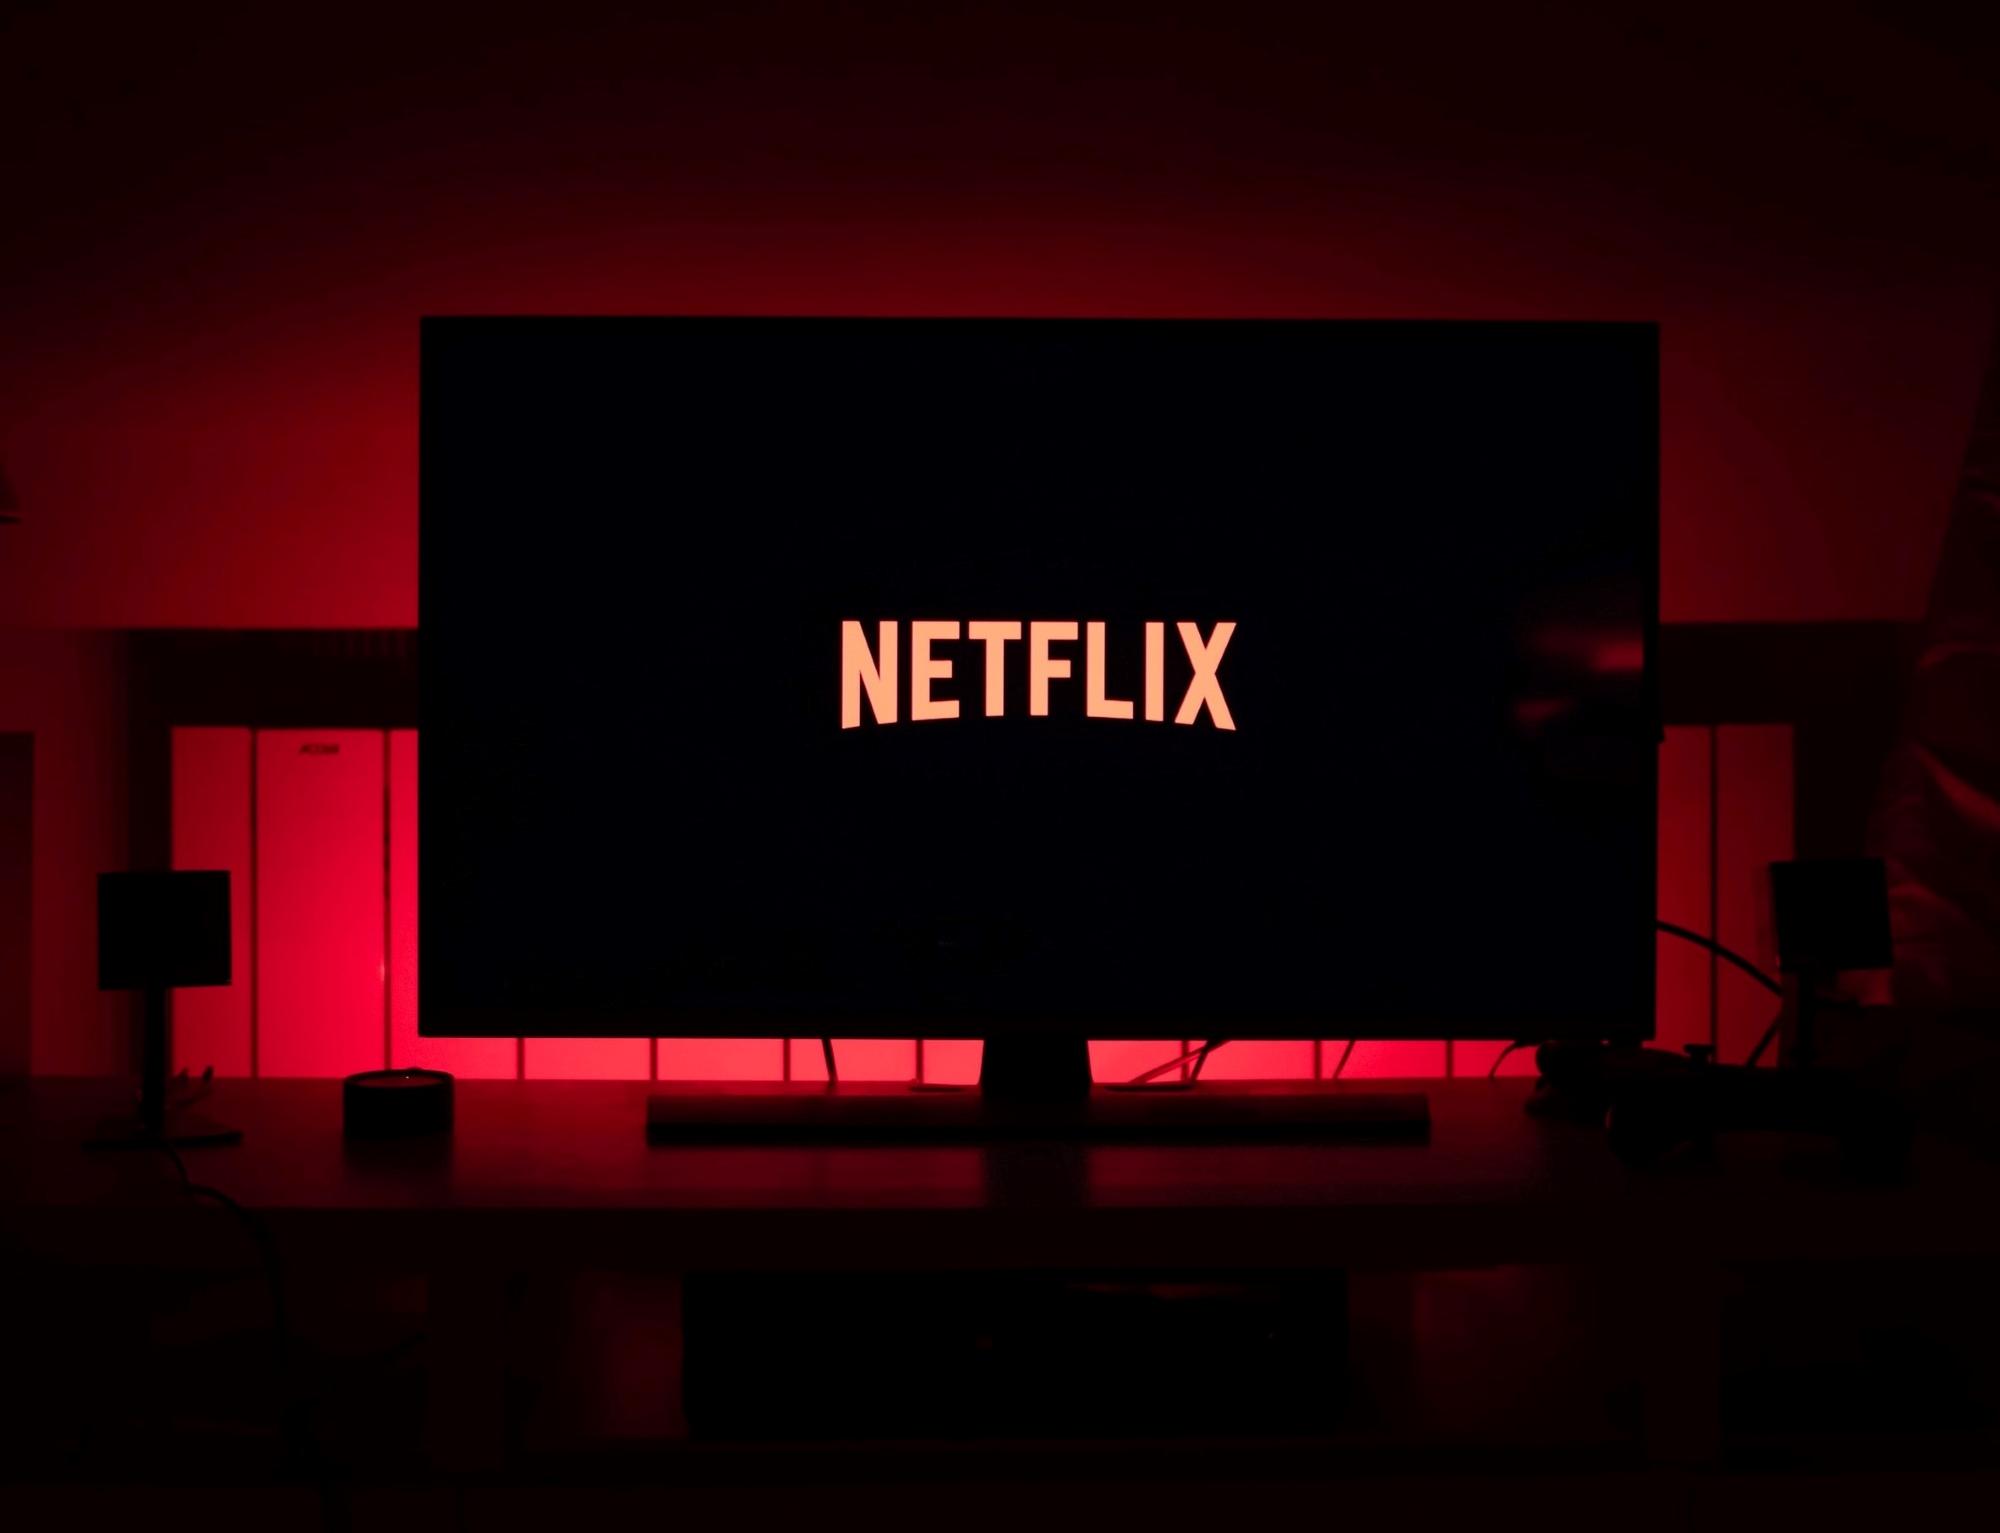 Netflix Q3 subscriber growth stalls amid pandemic surge slowdown